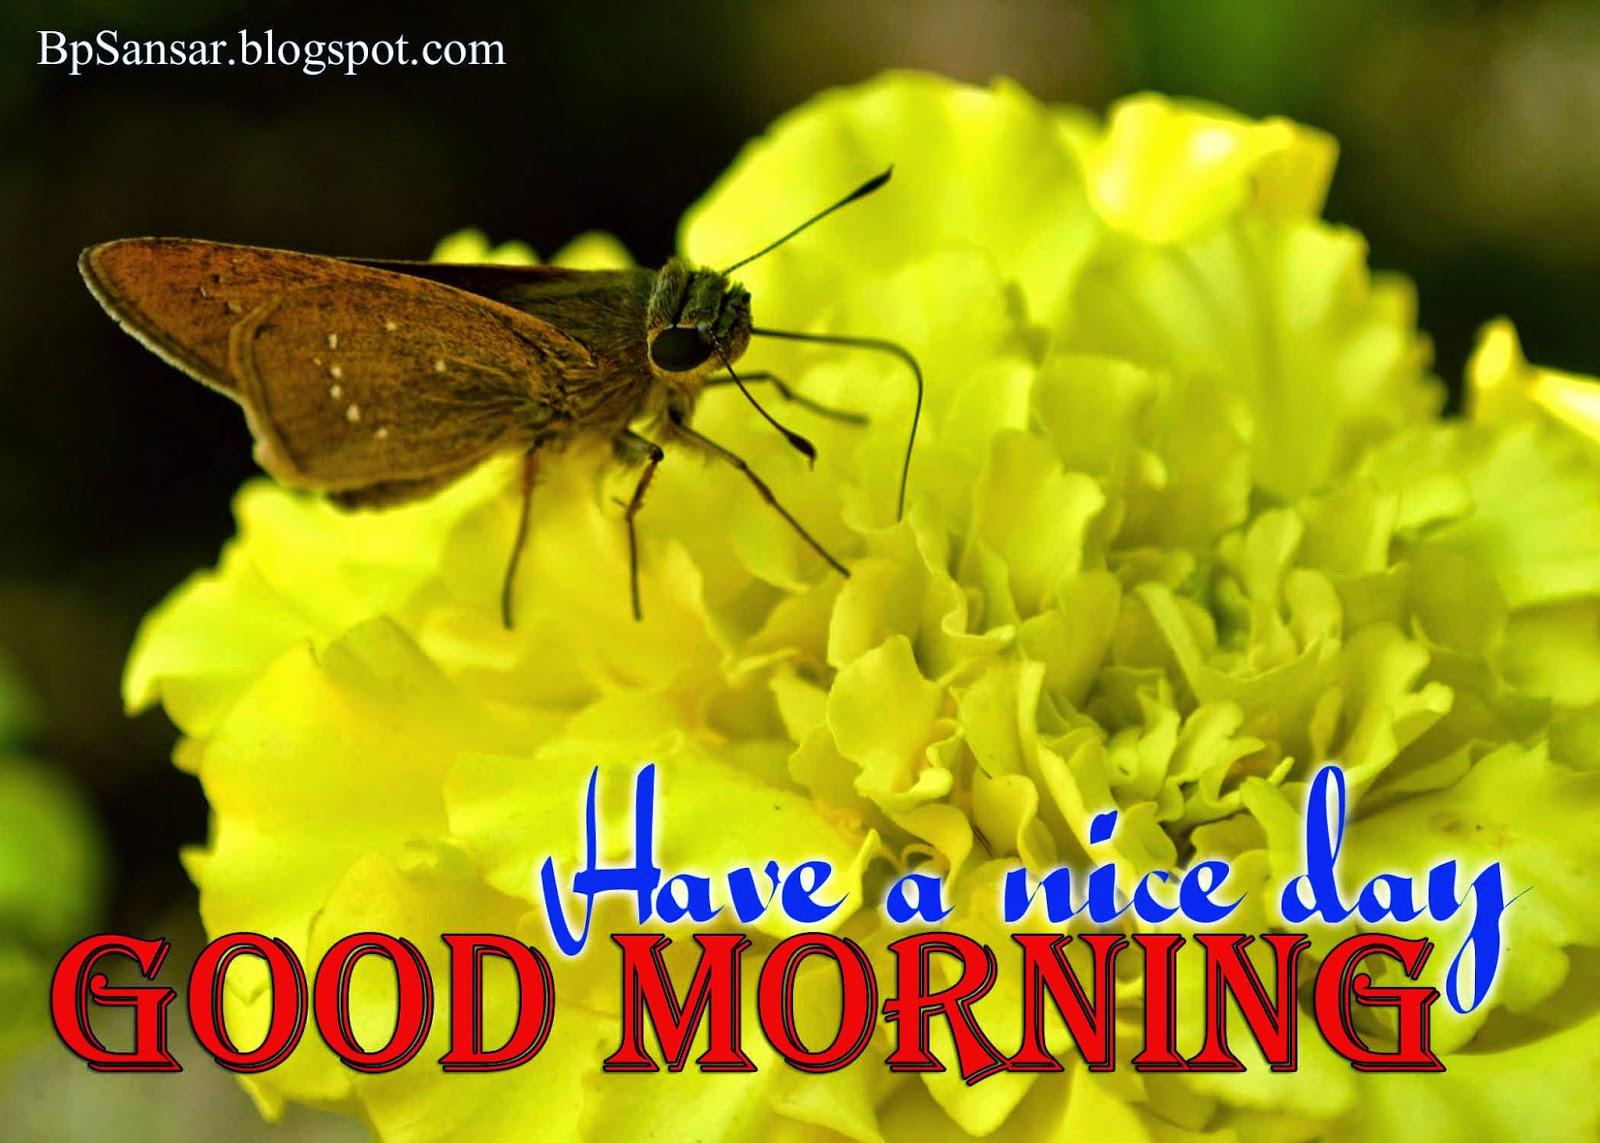 Good Morning Greeting Card 2014 - All Greeting Card